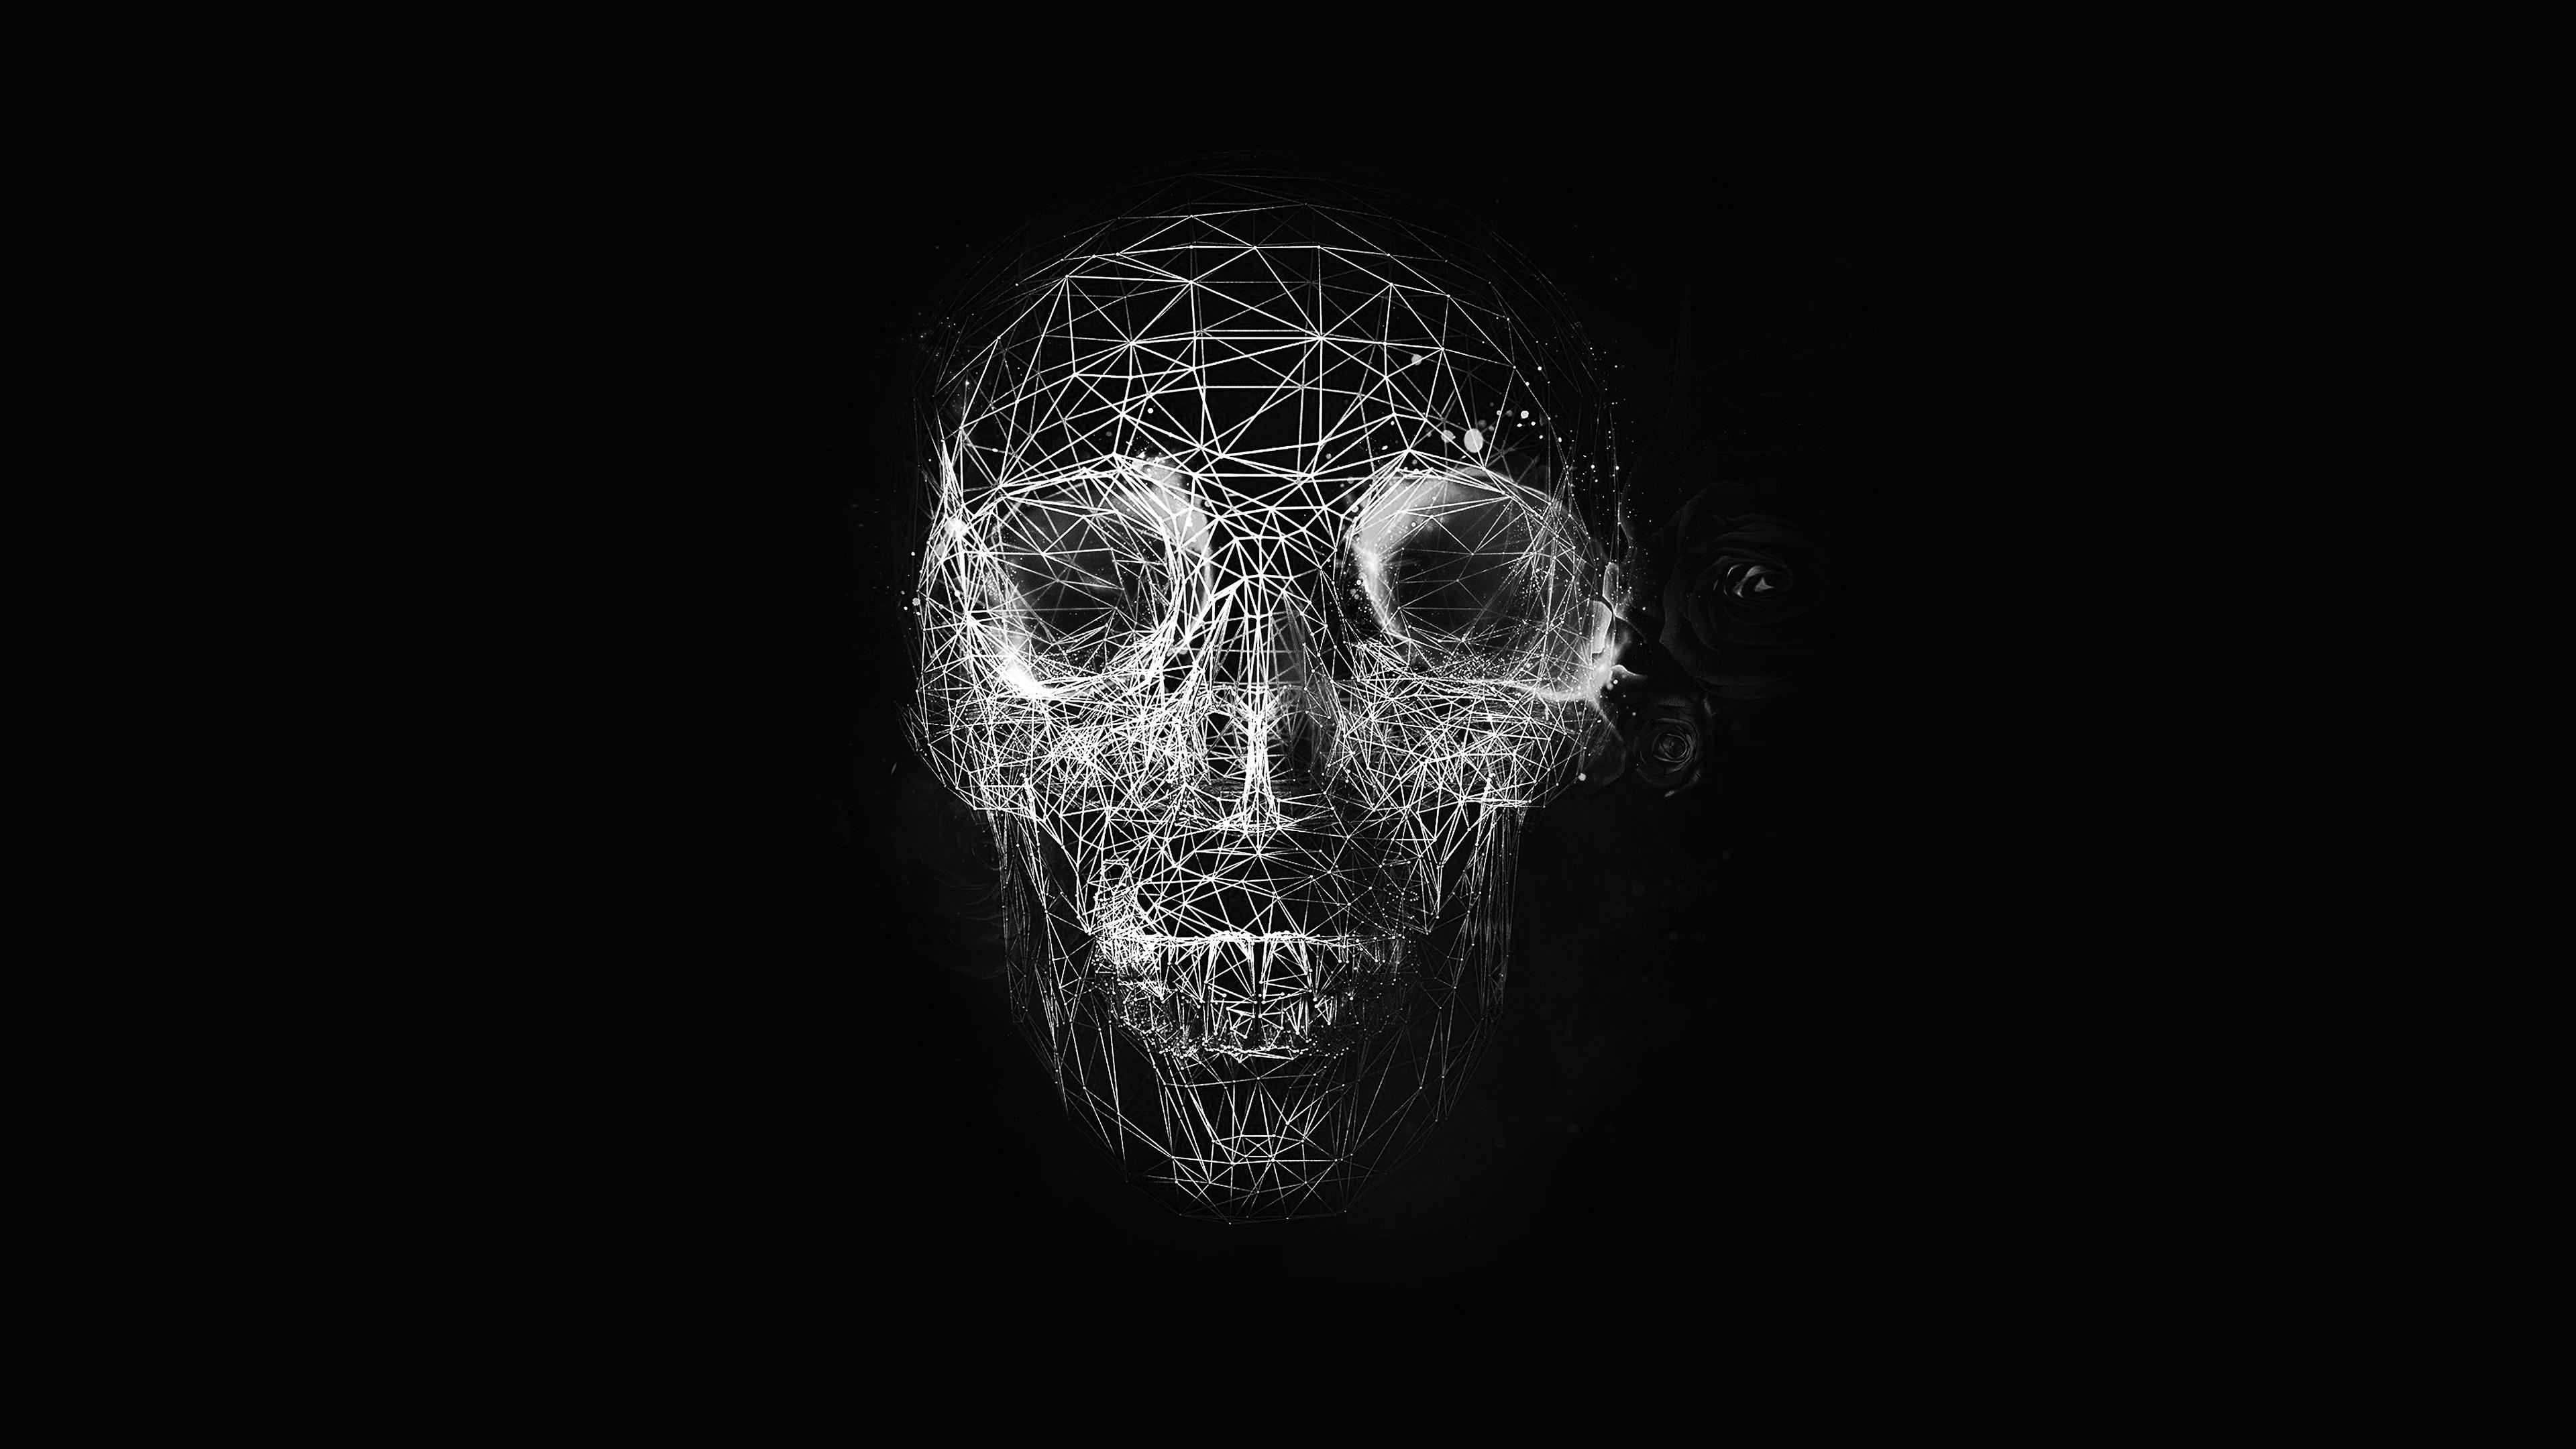 Iphone Optical Illusion Wallpaper I Love Papers At04 Digital Skull Dark Abstract Art